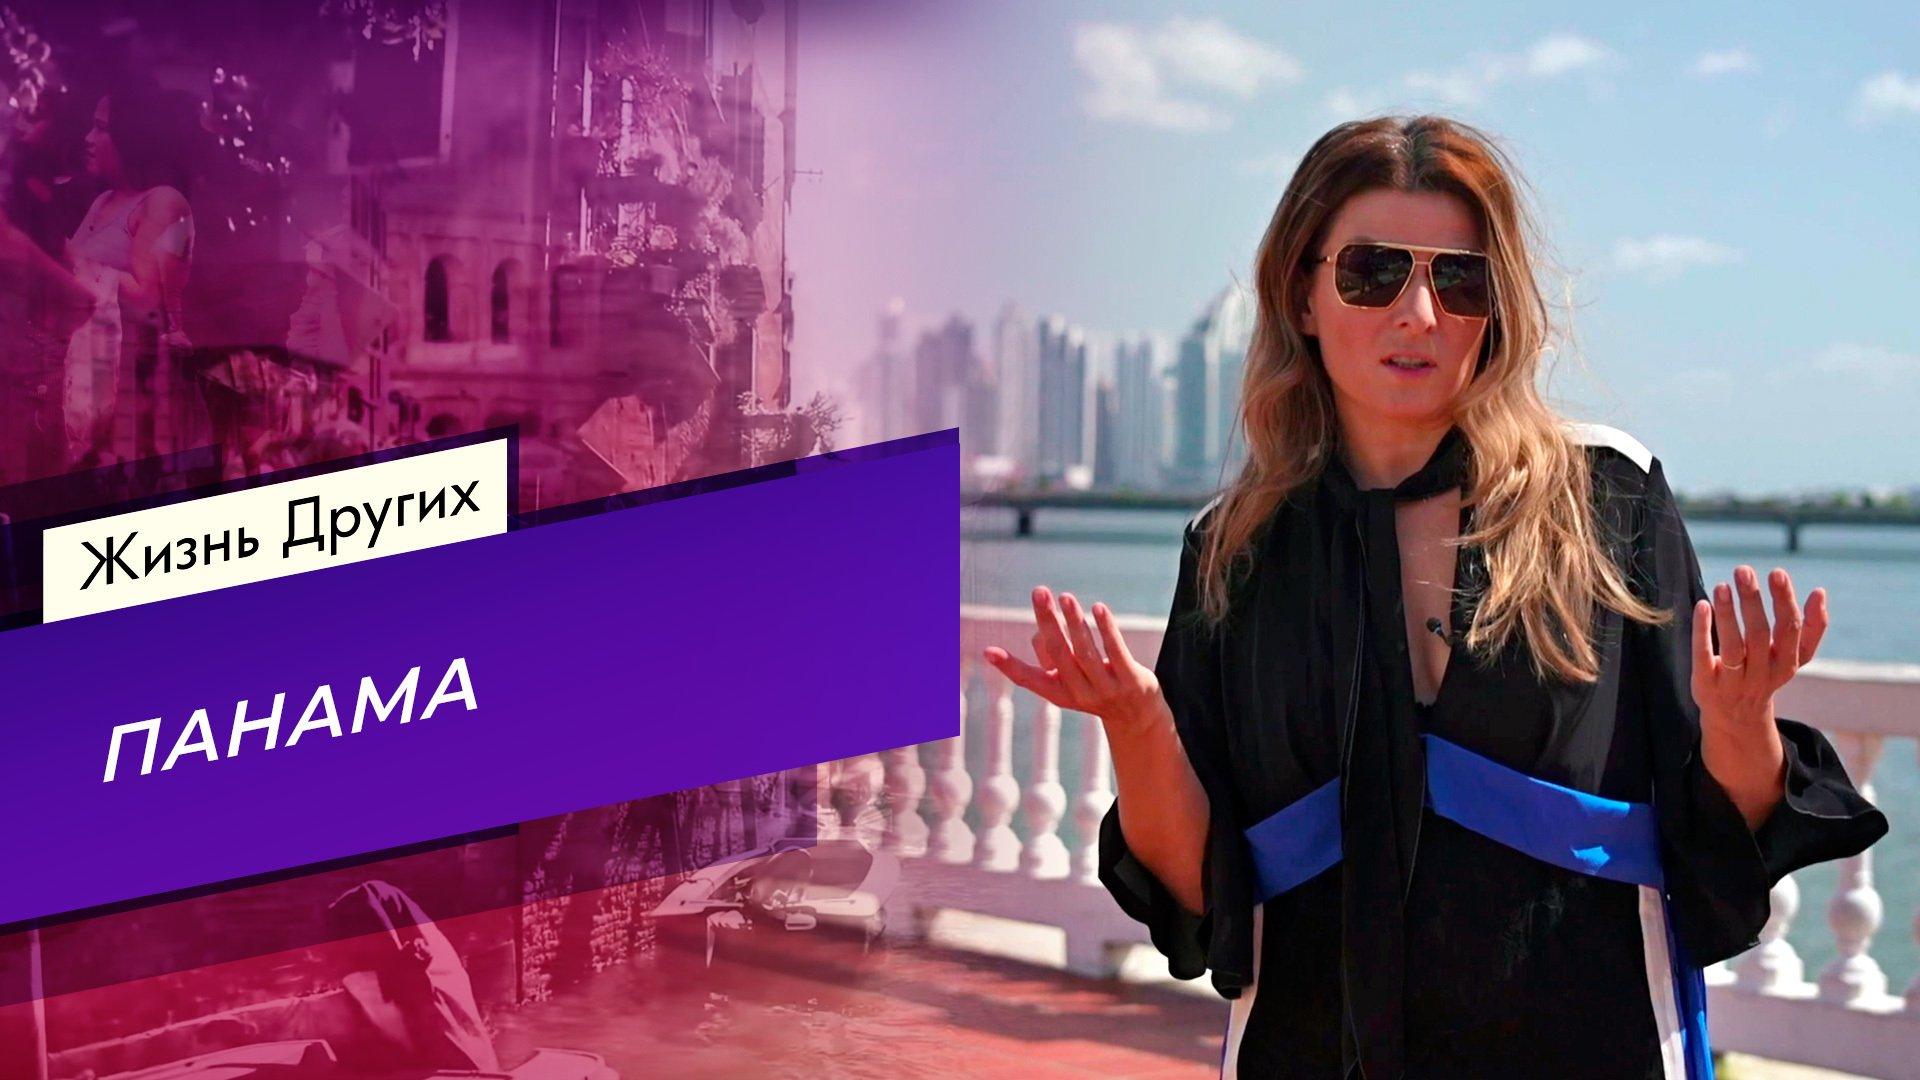 Жанна Бадоева впроекте-путешествии «Жизнь других». Панама